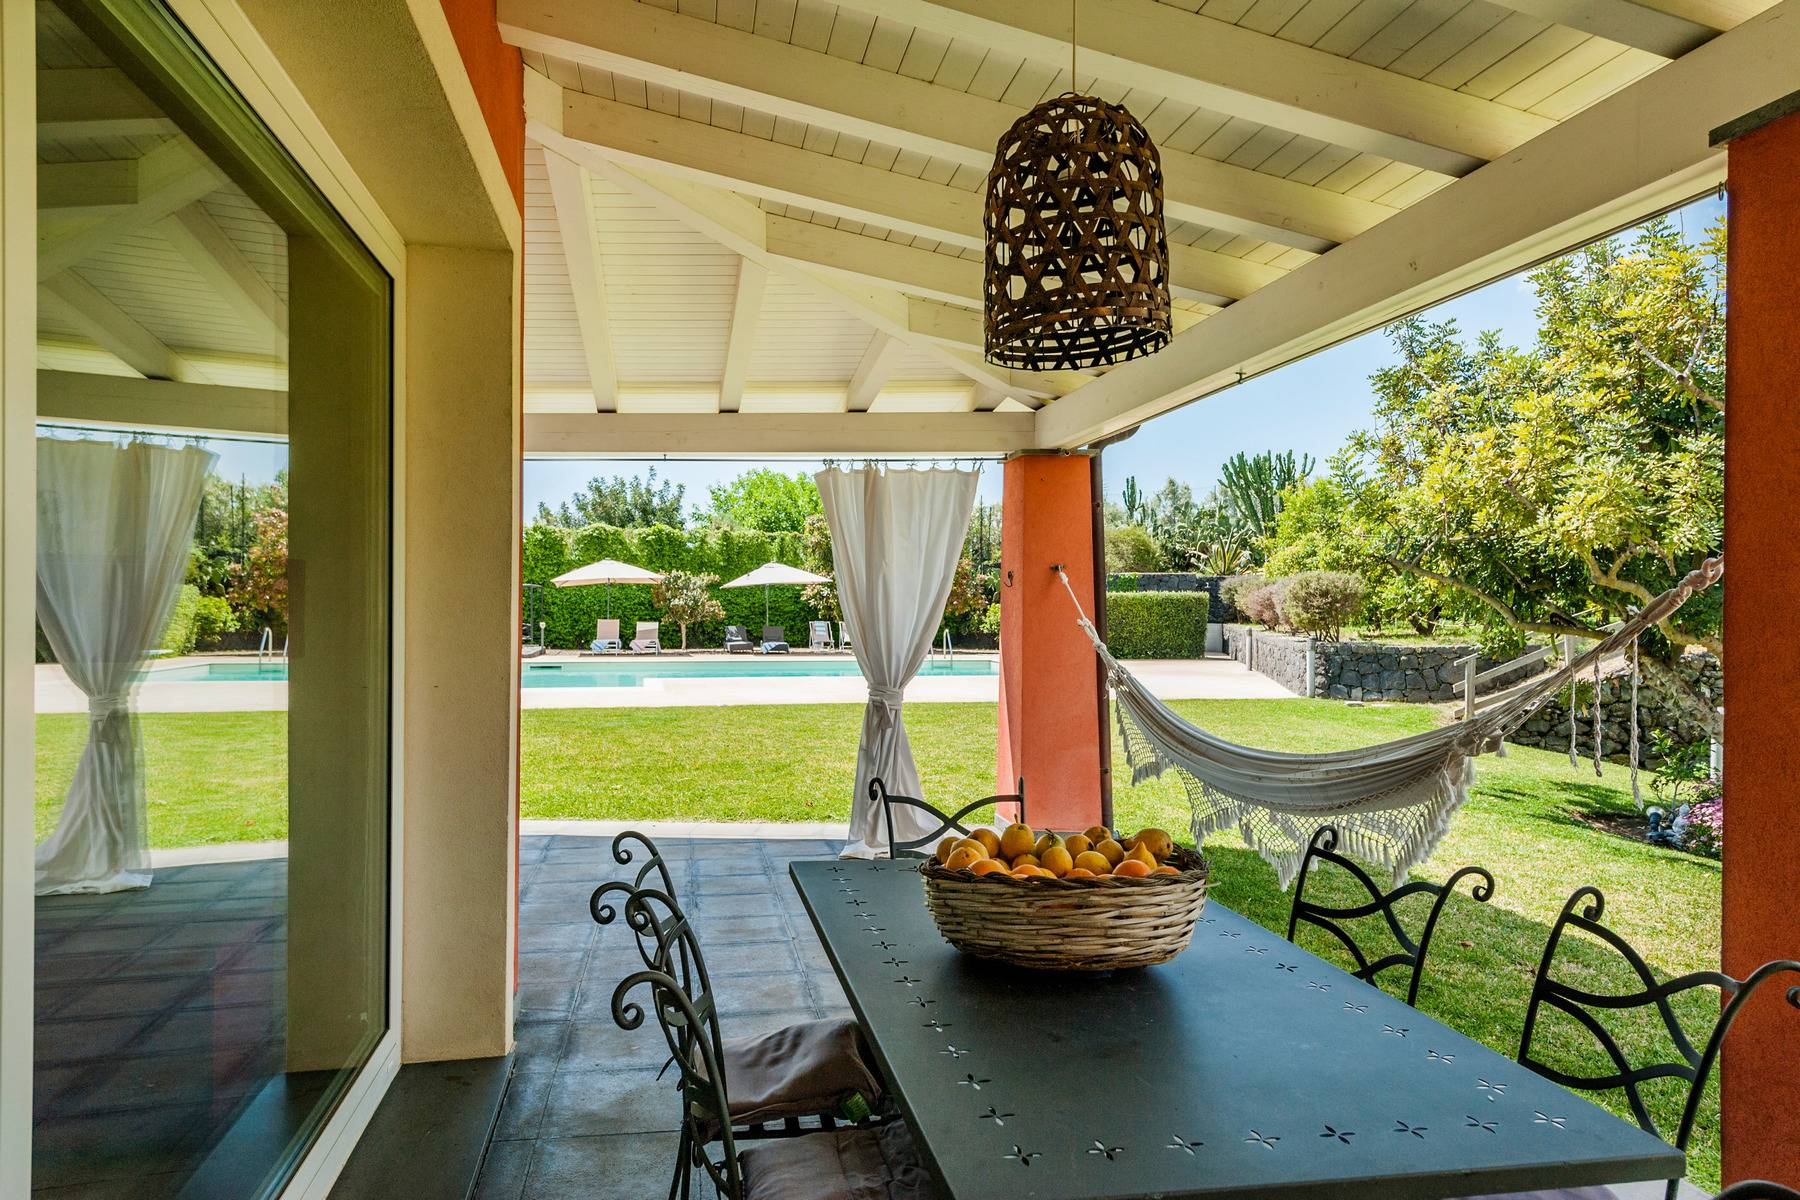 Villa esclusiva con piscina con vista ad Acireale - 2